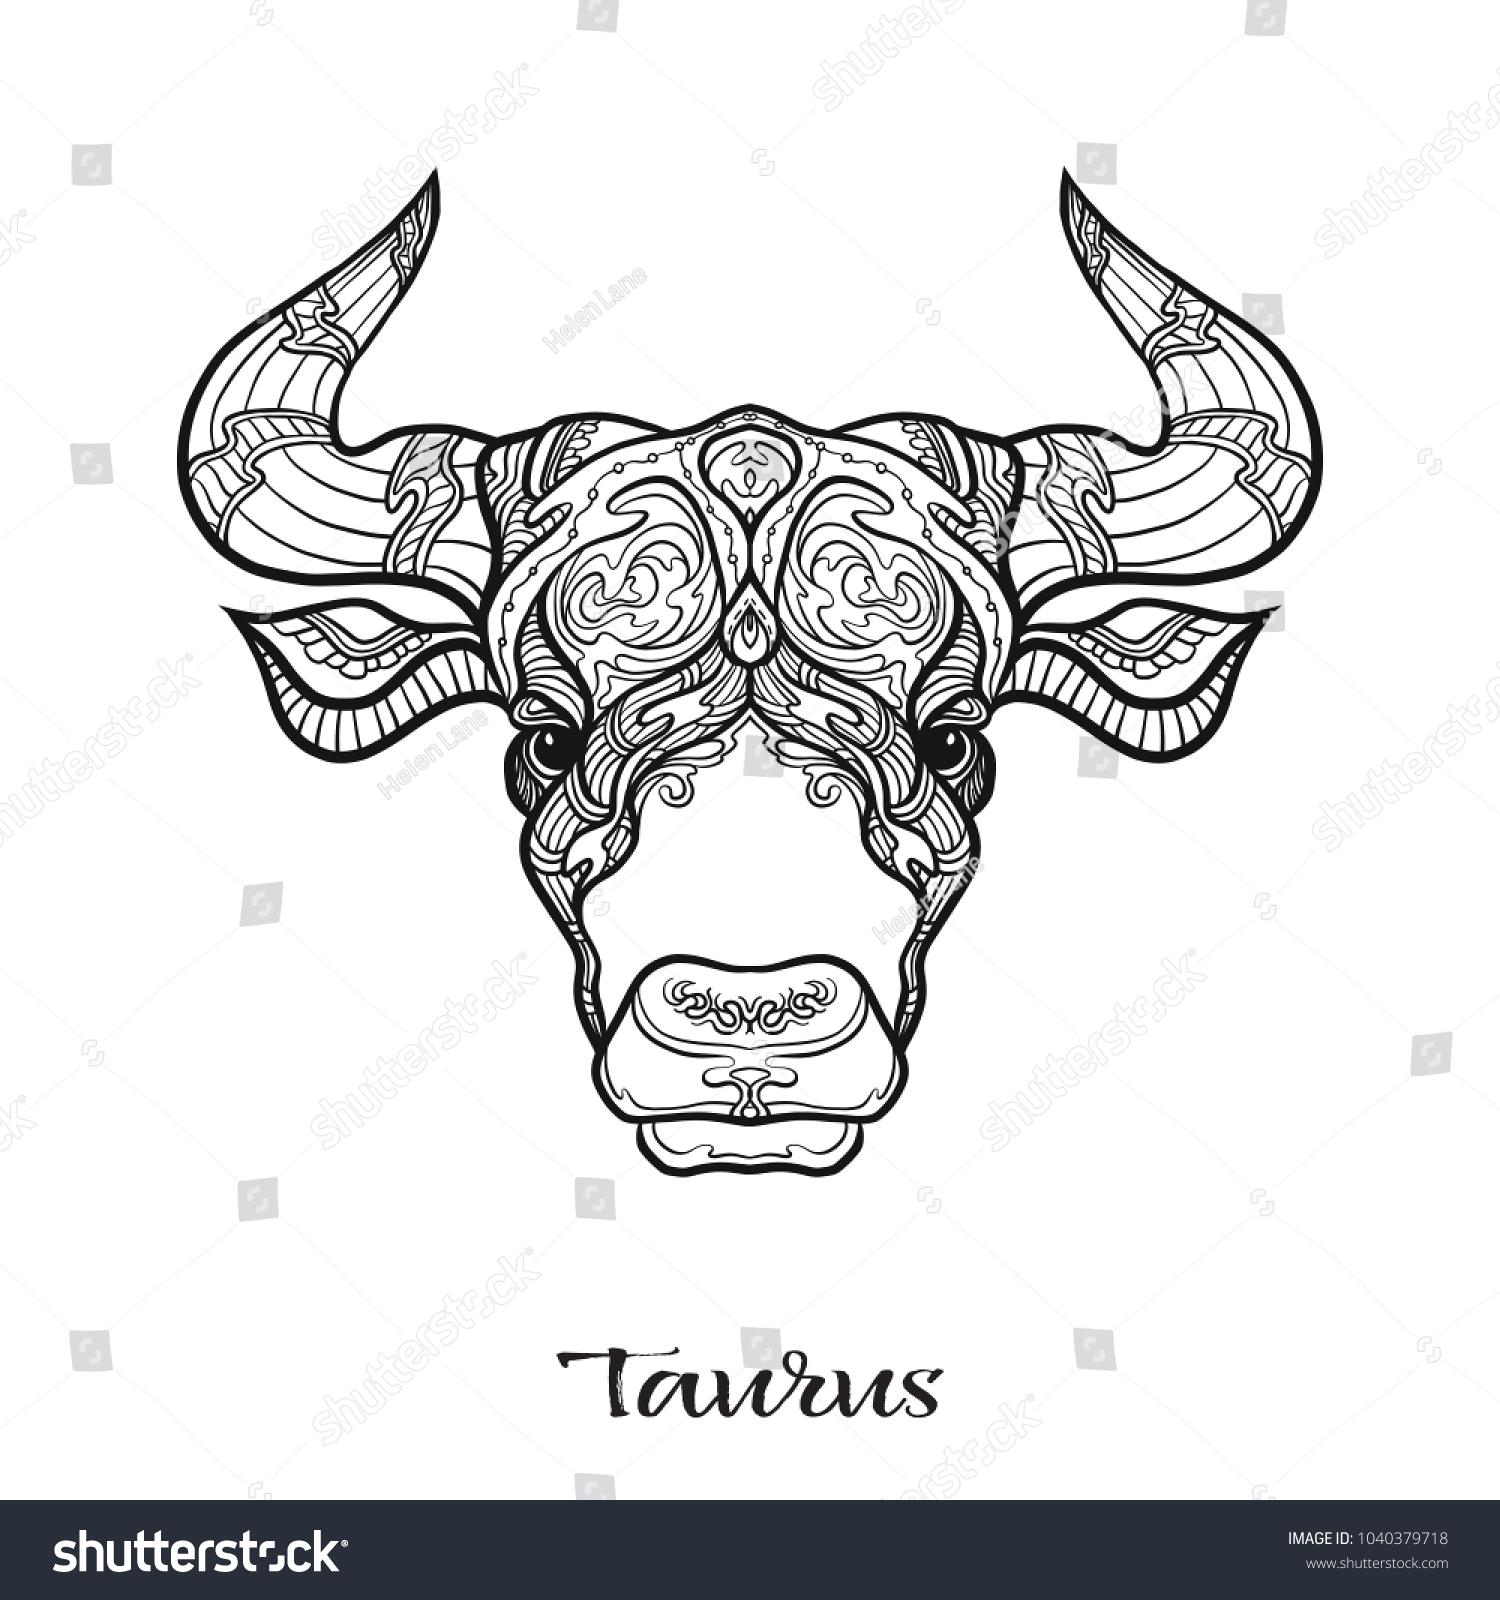 Taurus Bull Ox Zodiac Sign Astrological Stock Vector (Royalty Free ...